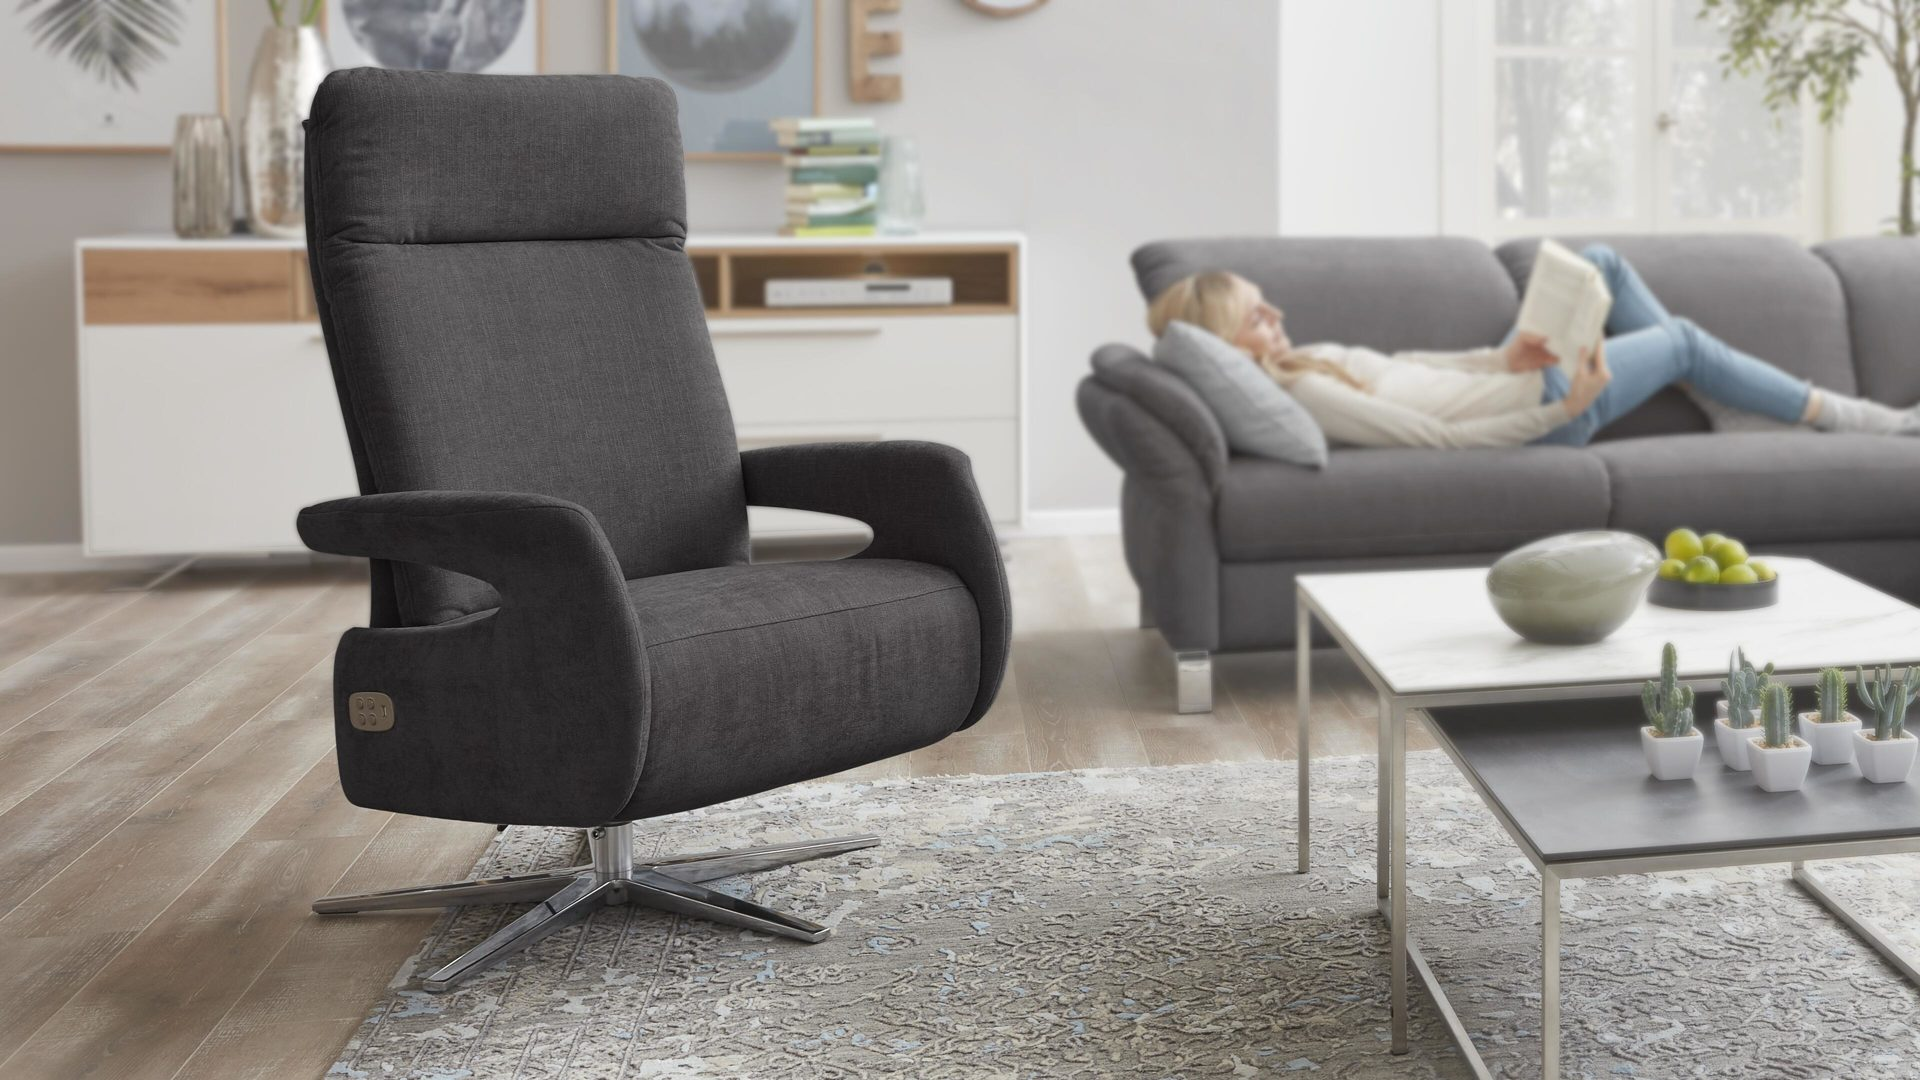 Polster Für Sessel Clubsessel Polster Sessel Lounge Jeans